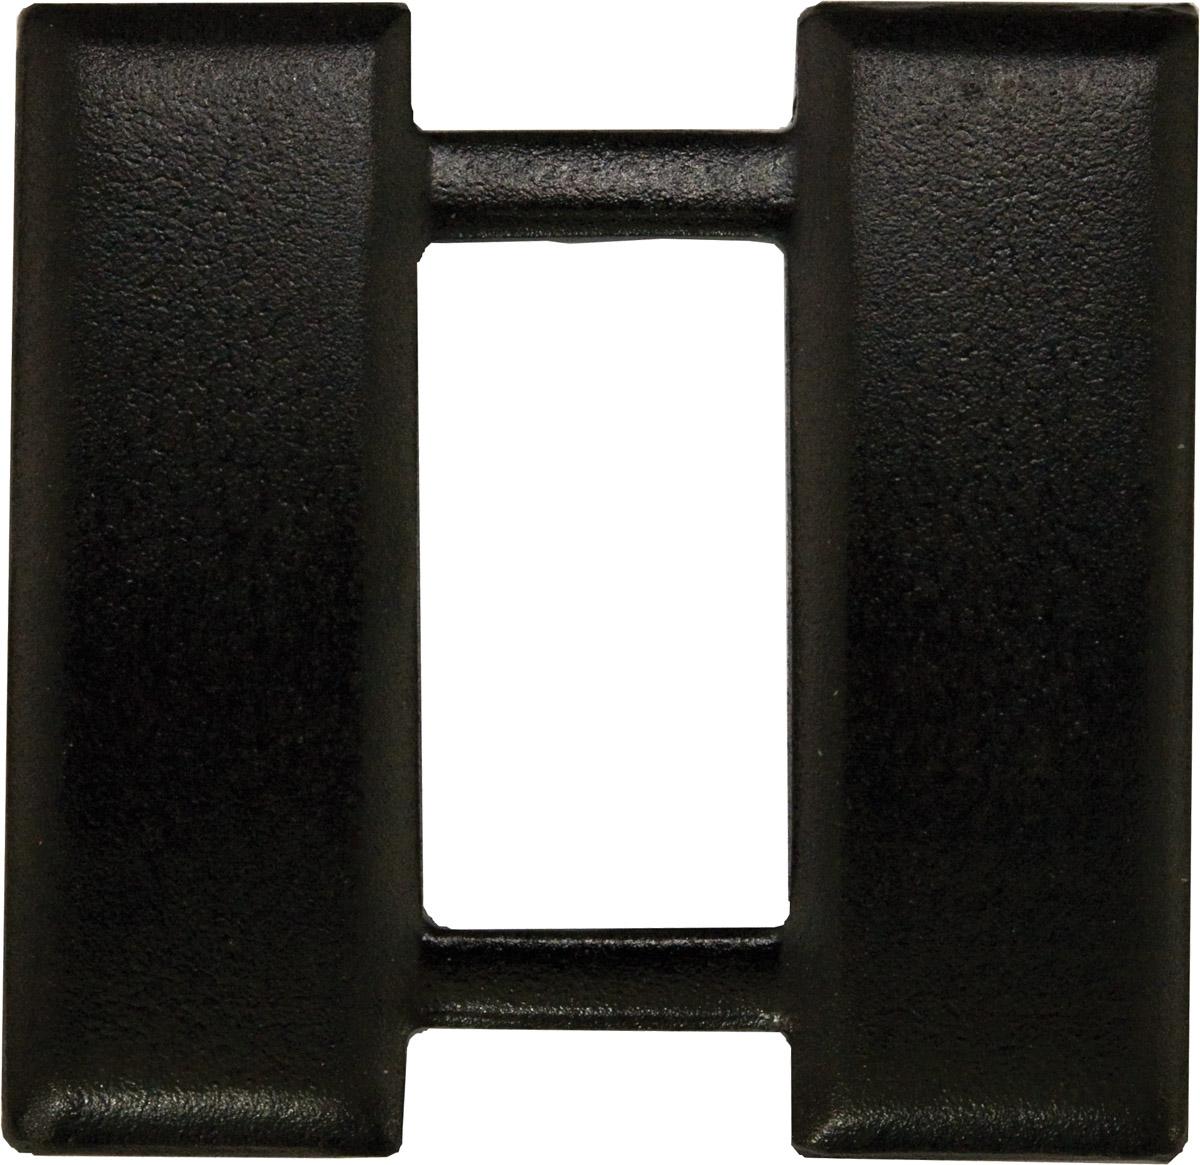 Police Rank (U-252B) Captain Bars Black (Miniature) 3/4